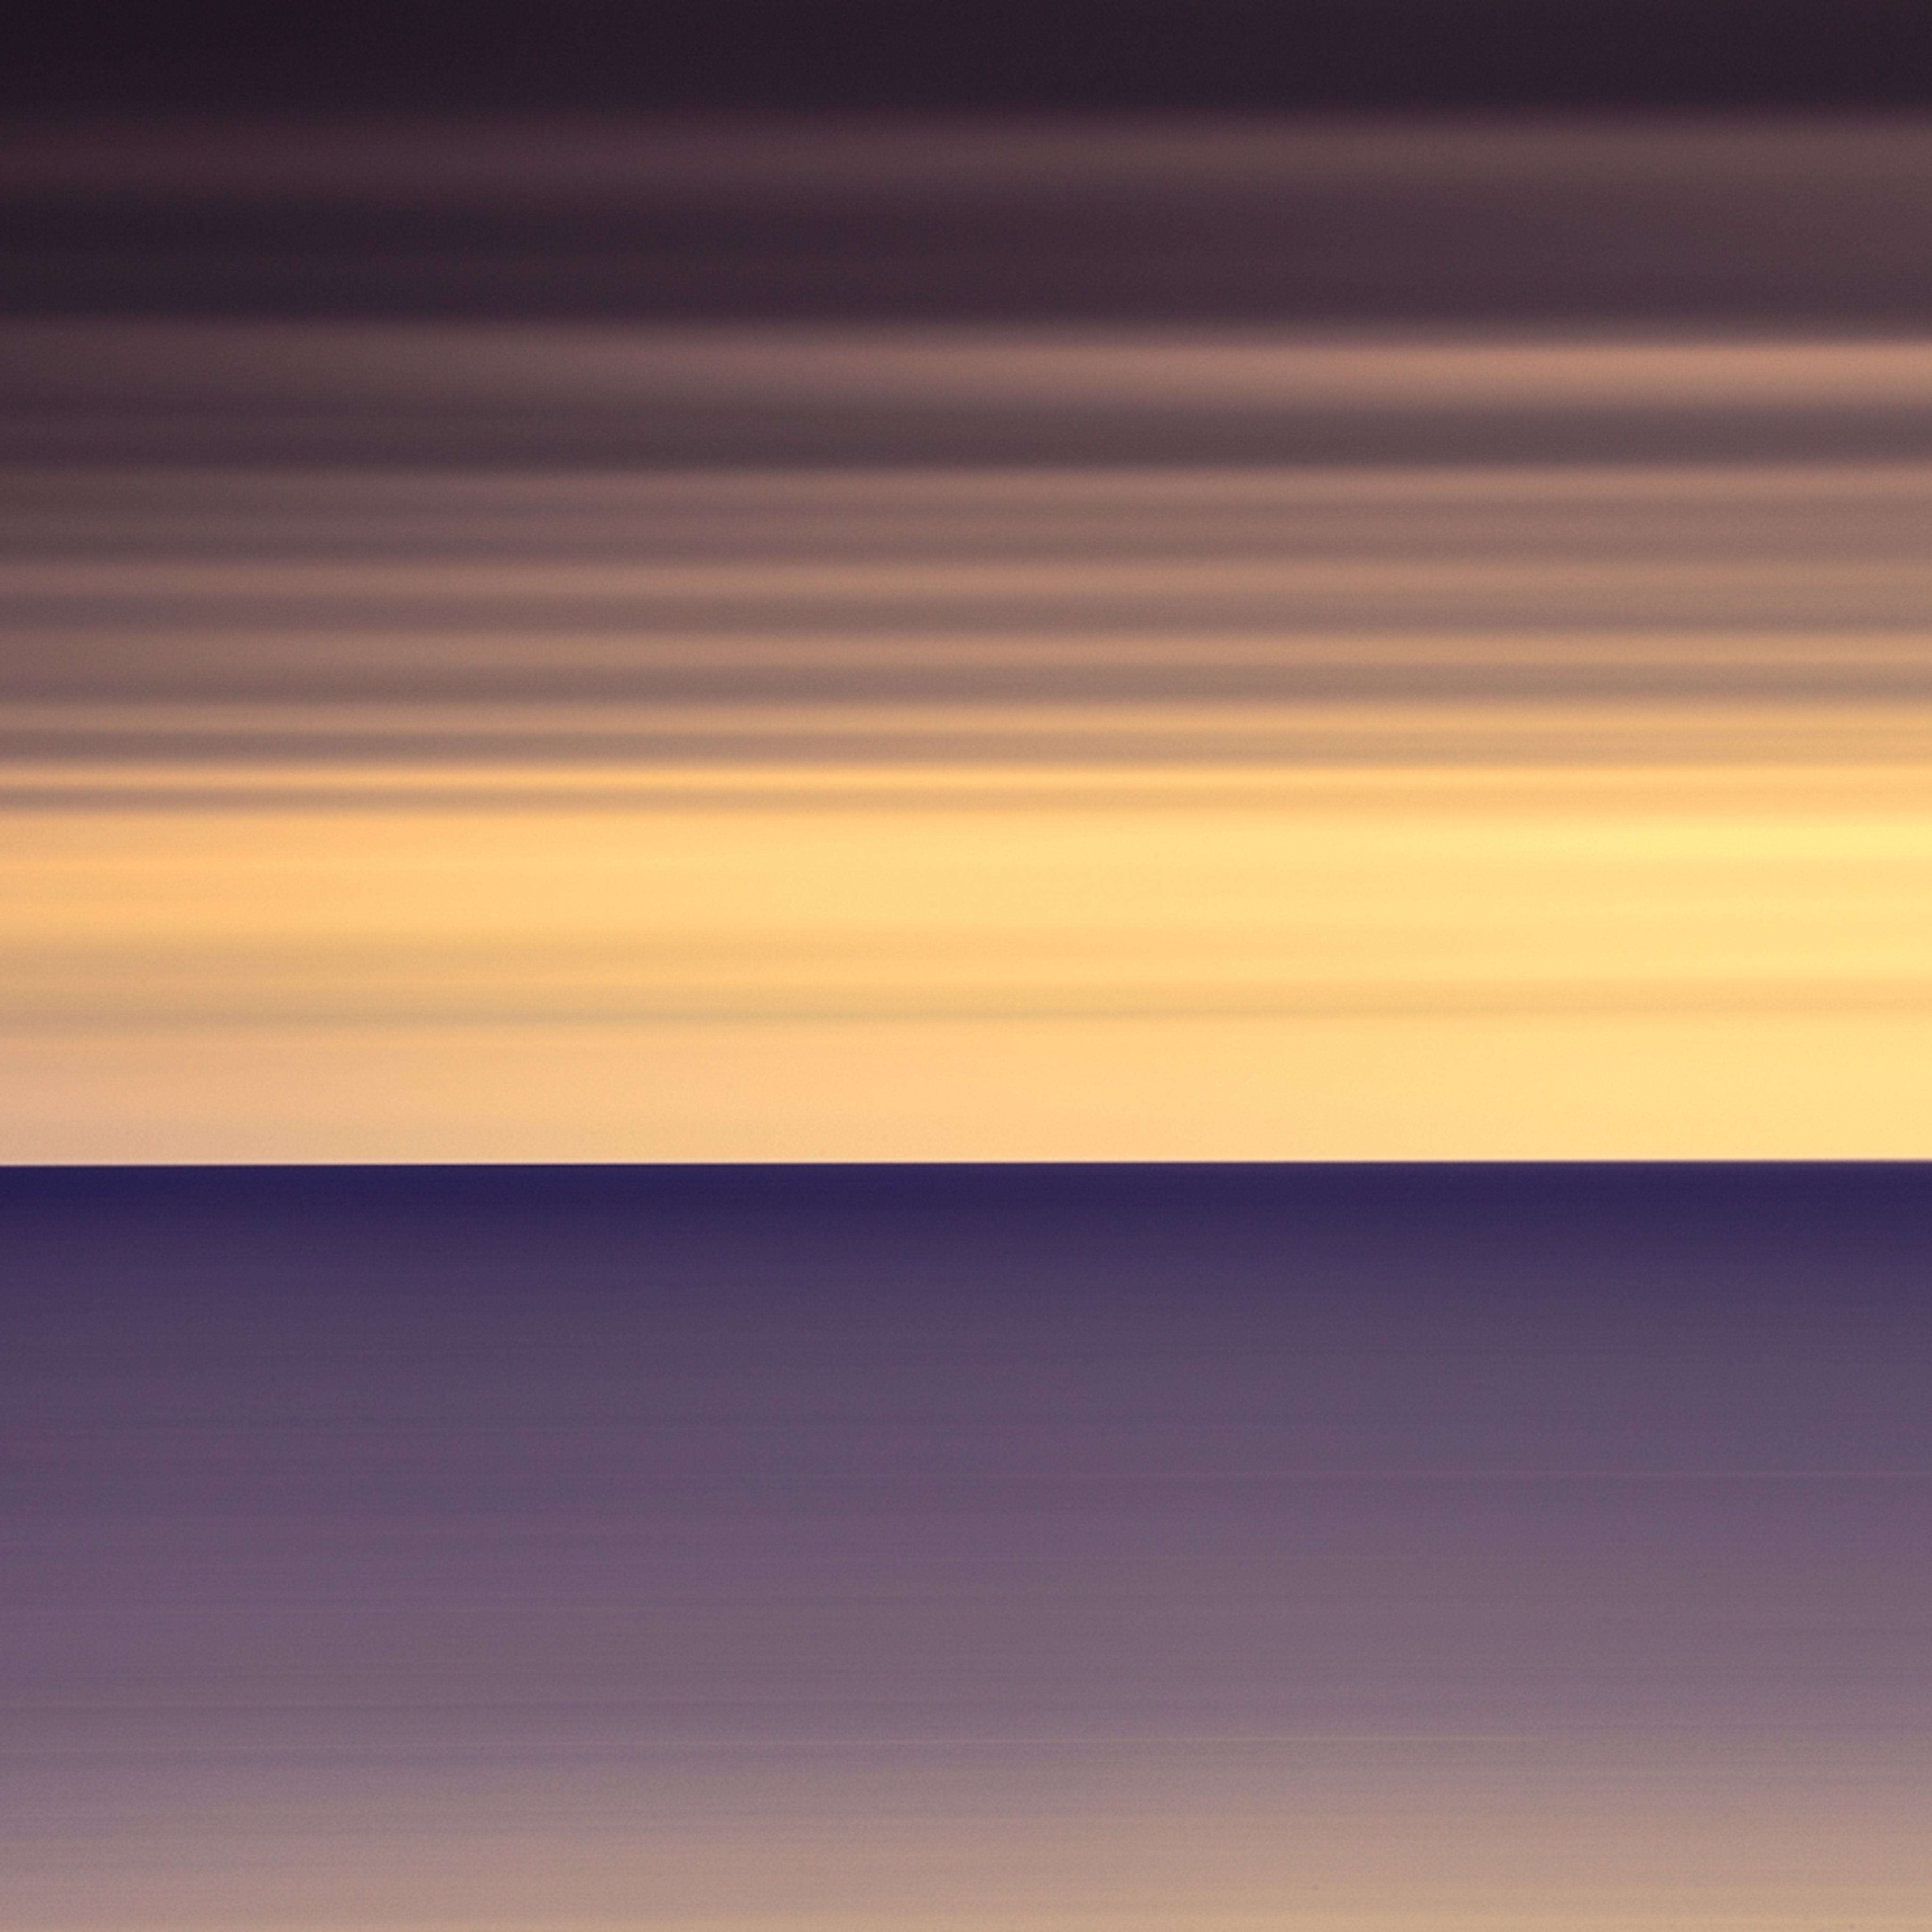 Orang purple abstract w4mpnp